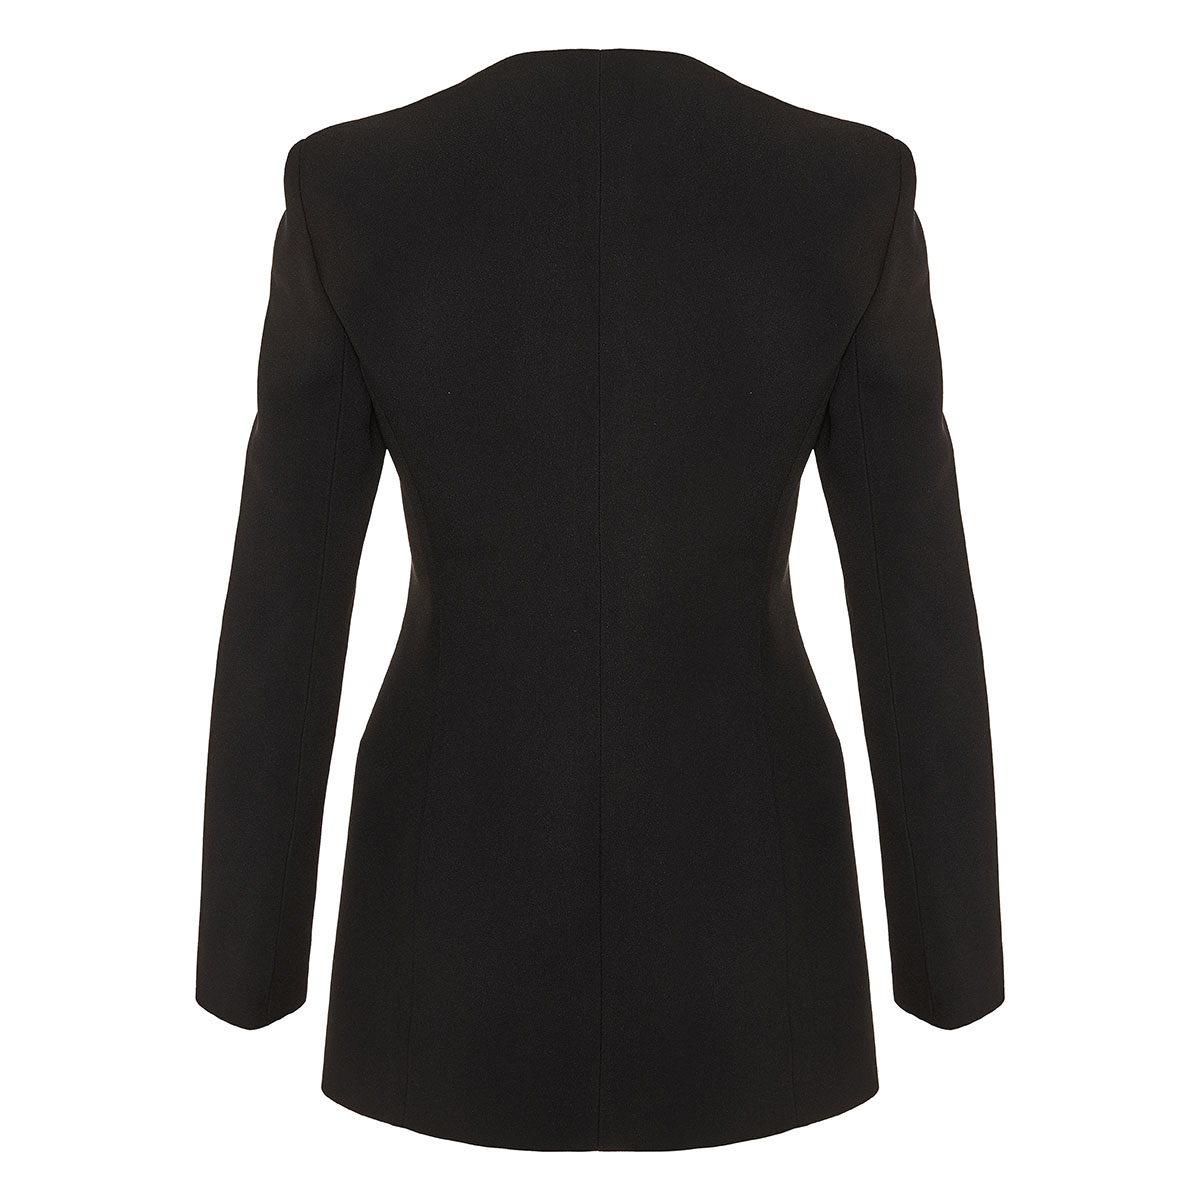 Heritage-neck single-breasted blazer